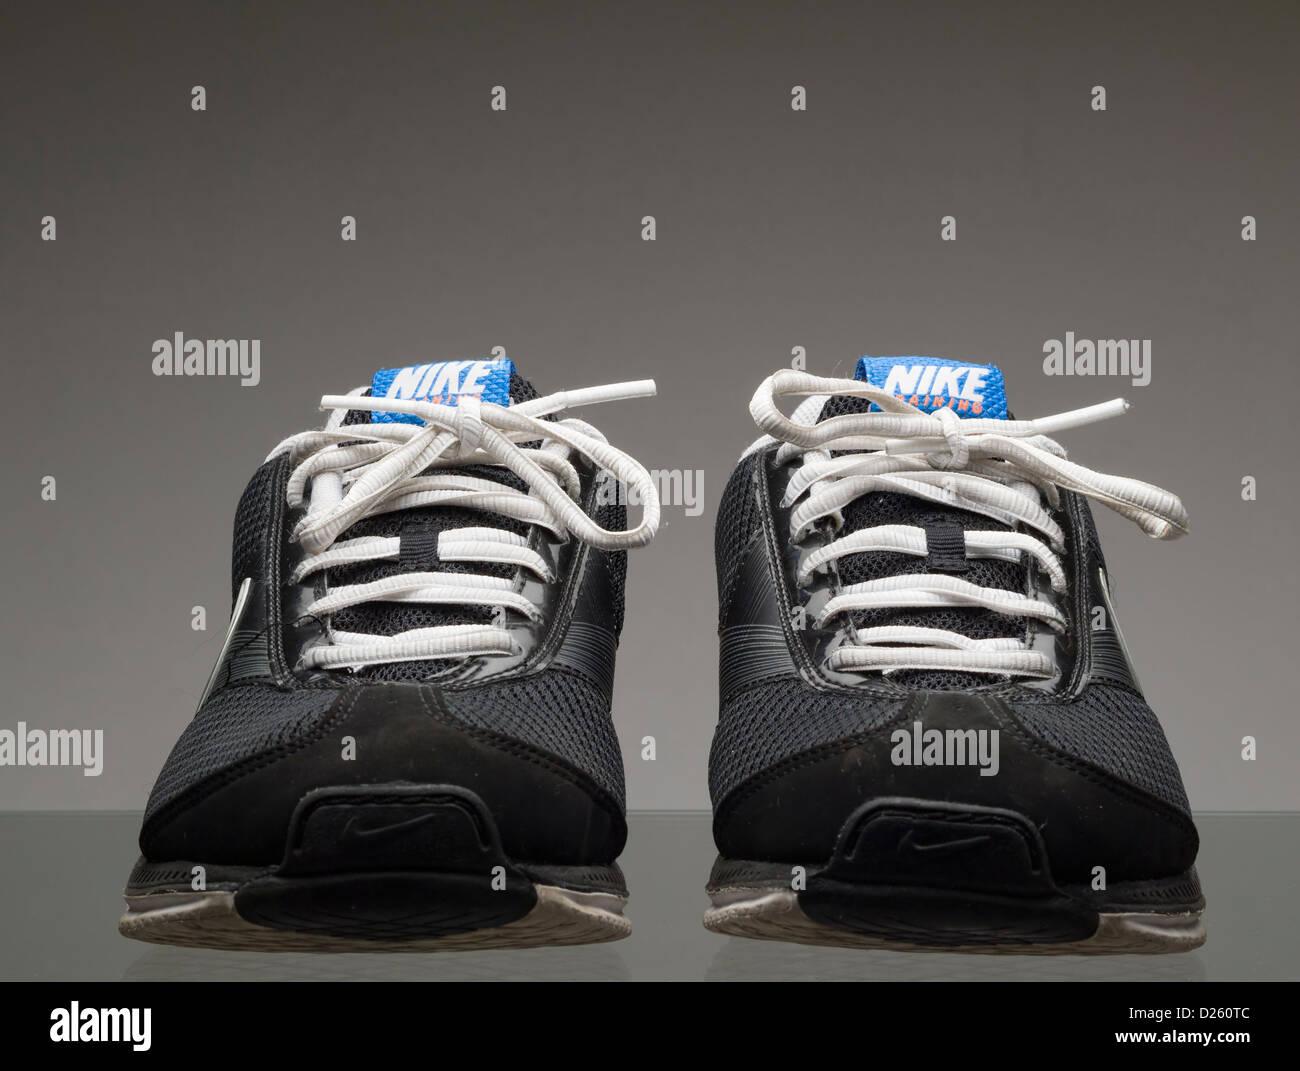 Nike Running Shoes Immagini e Fotos Stock Alamy  mXCbiq